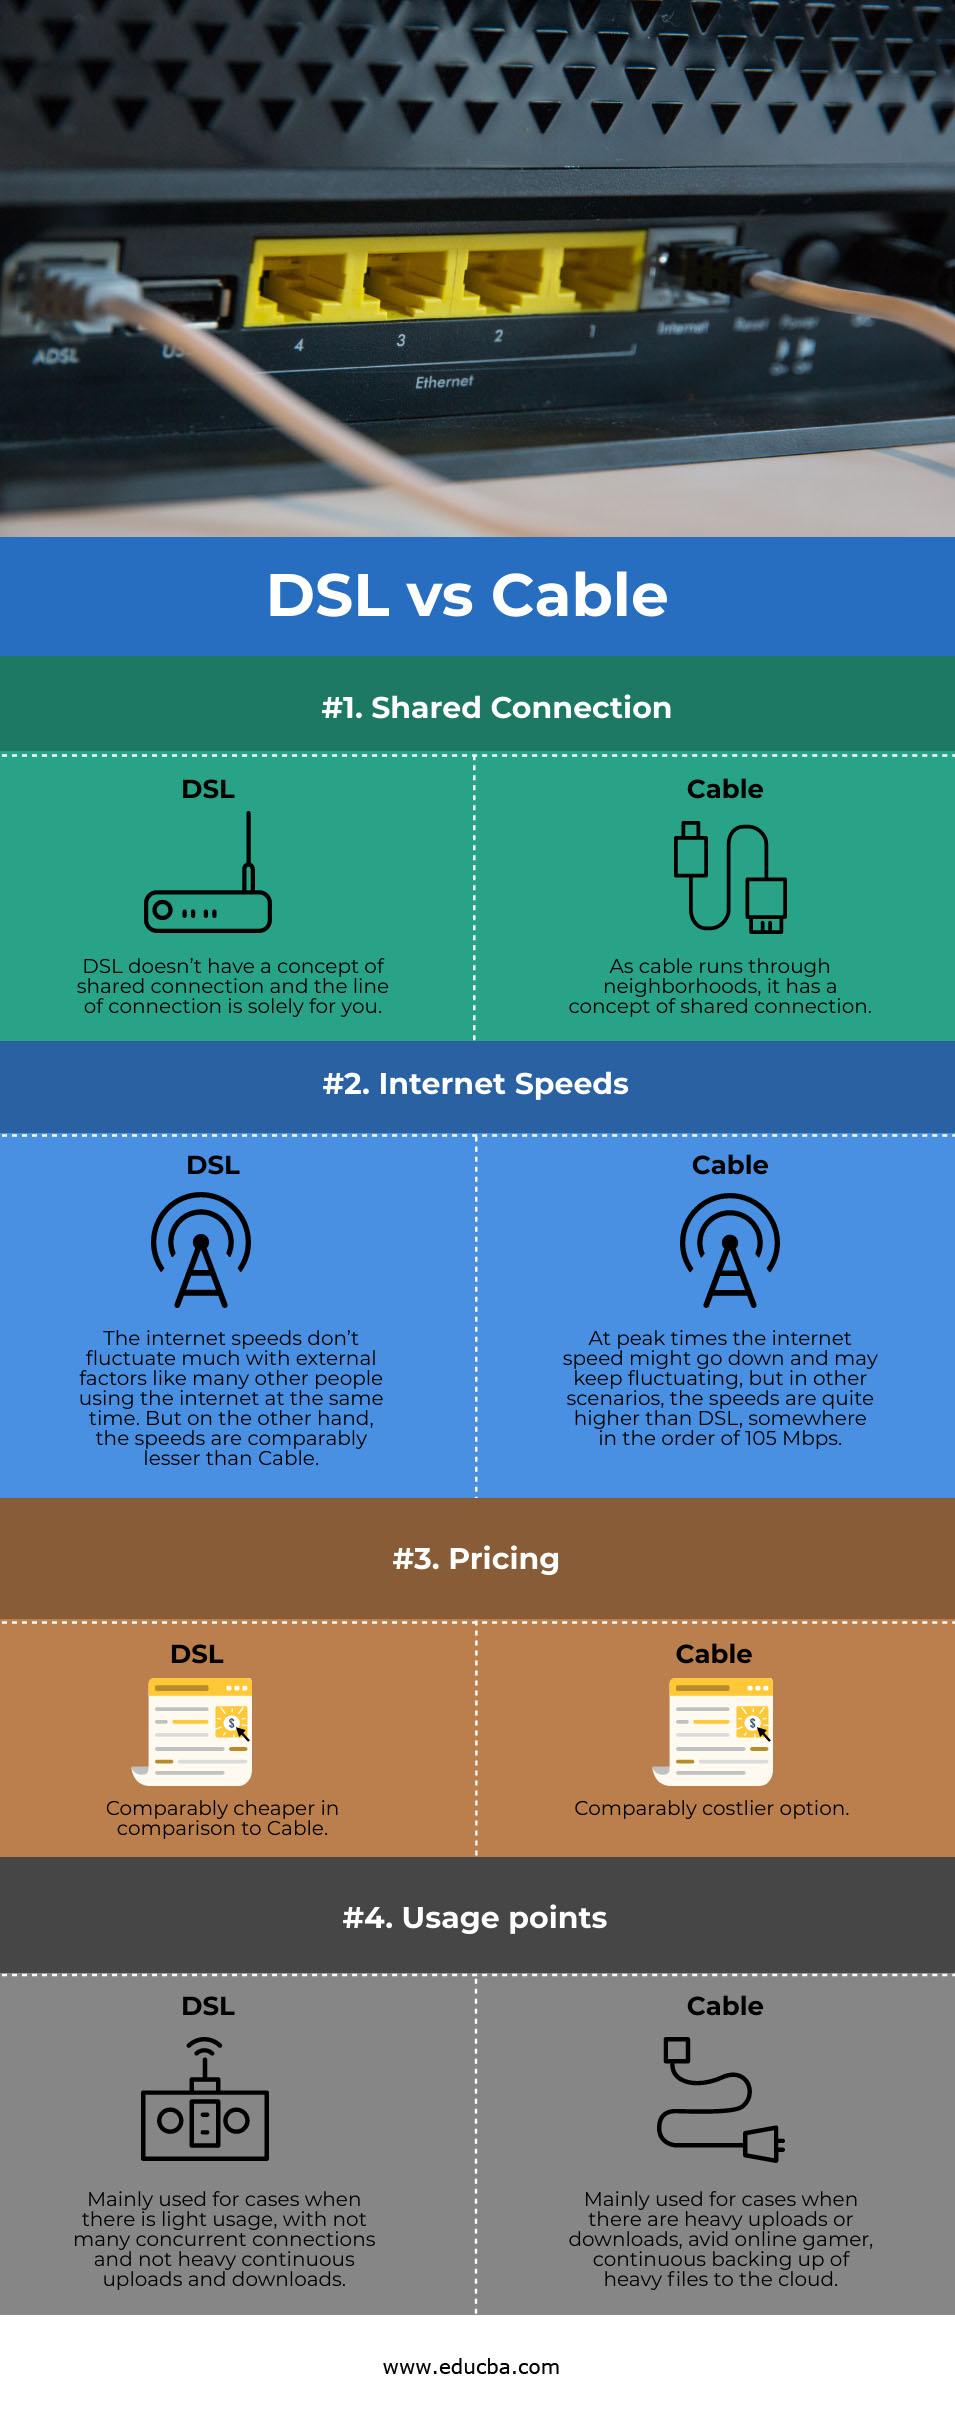 DSL vs Cable info